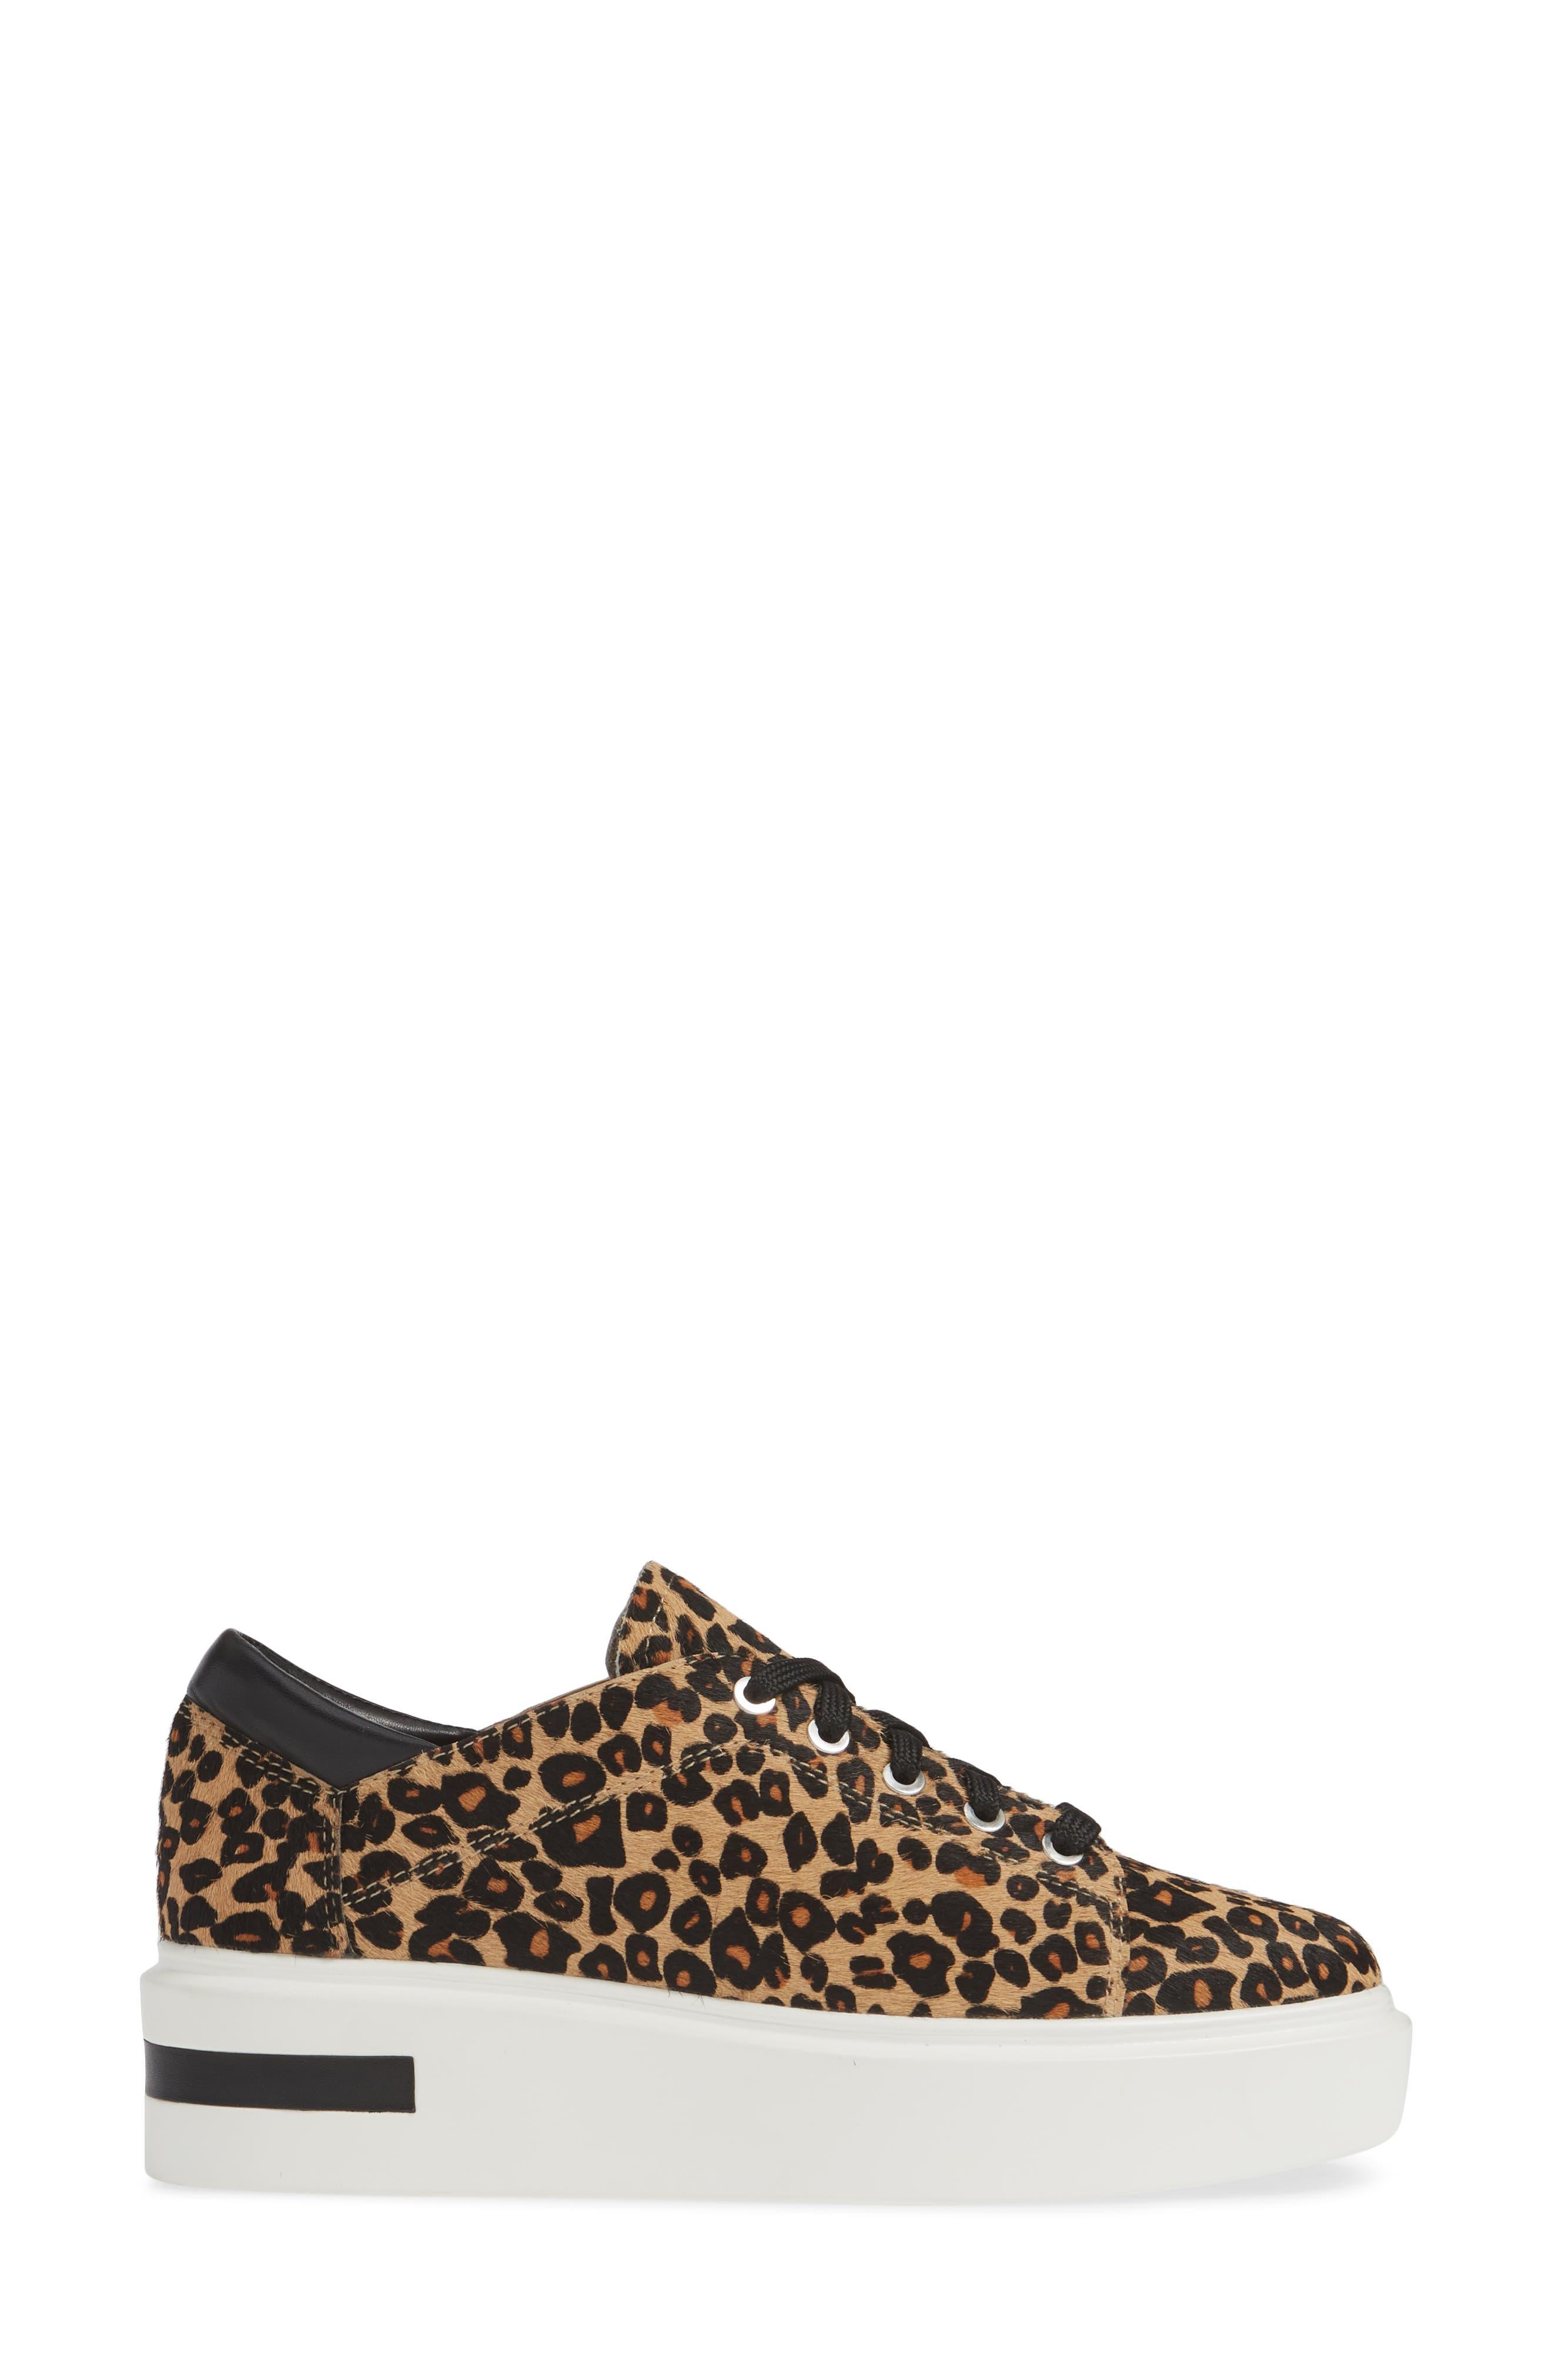 LINEA PAOLO, Kendra Genuine Calf Hair Platform Sneaker, Alternate thumbnail 3, color, LEOPARD PRINT CALF HAIR